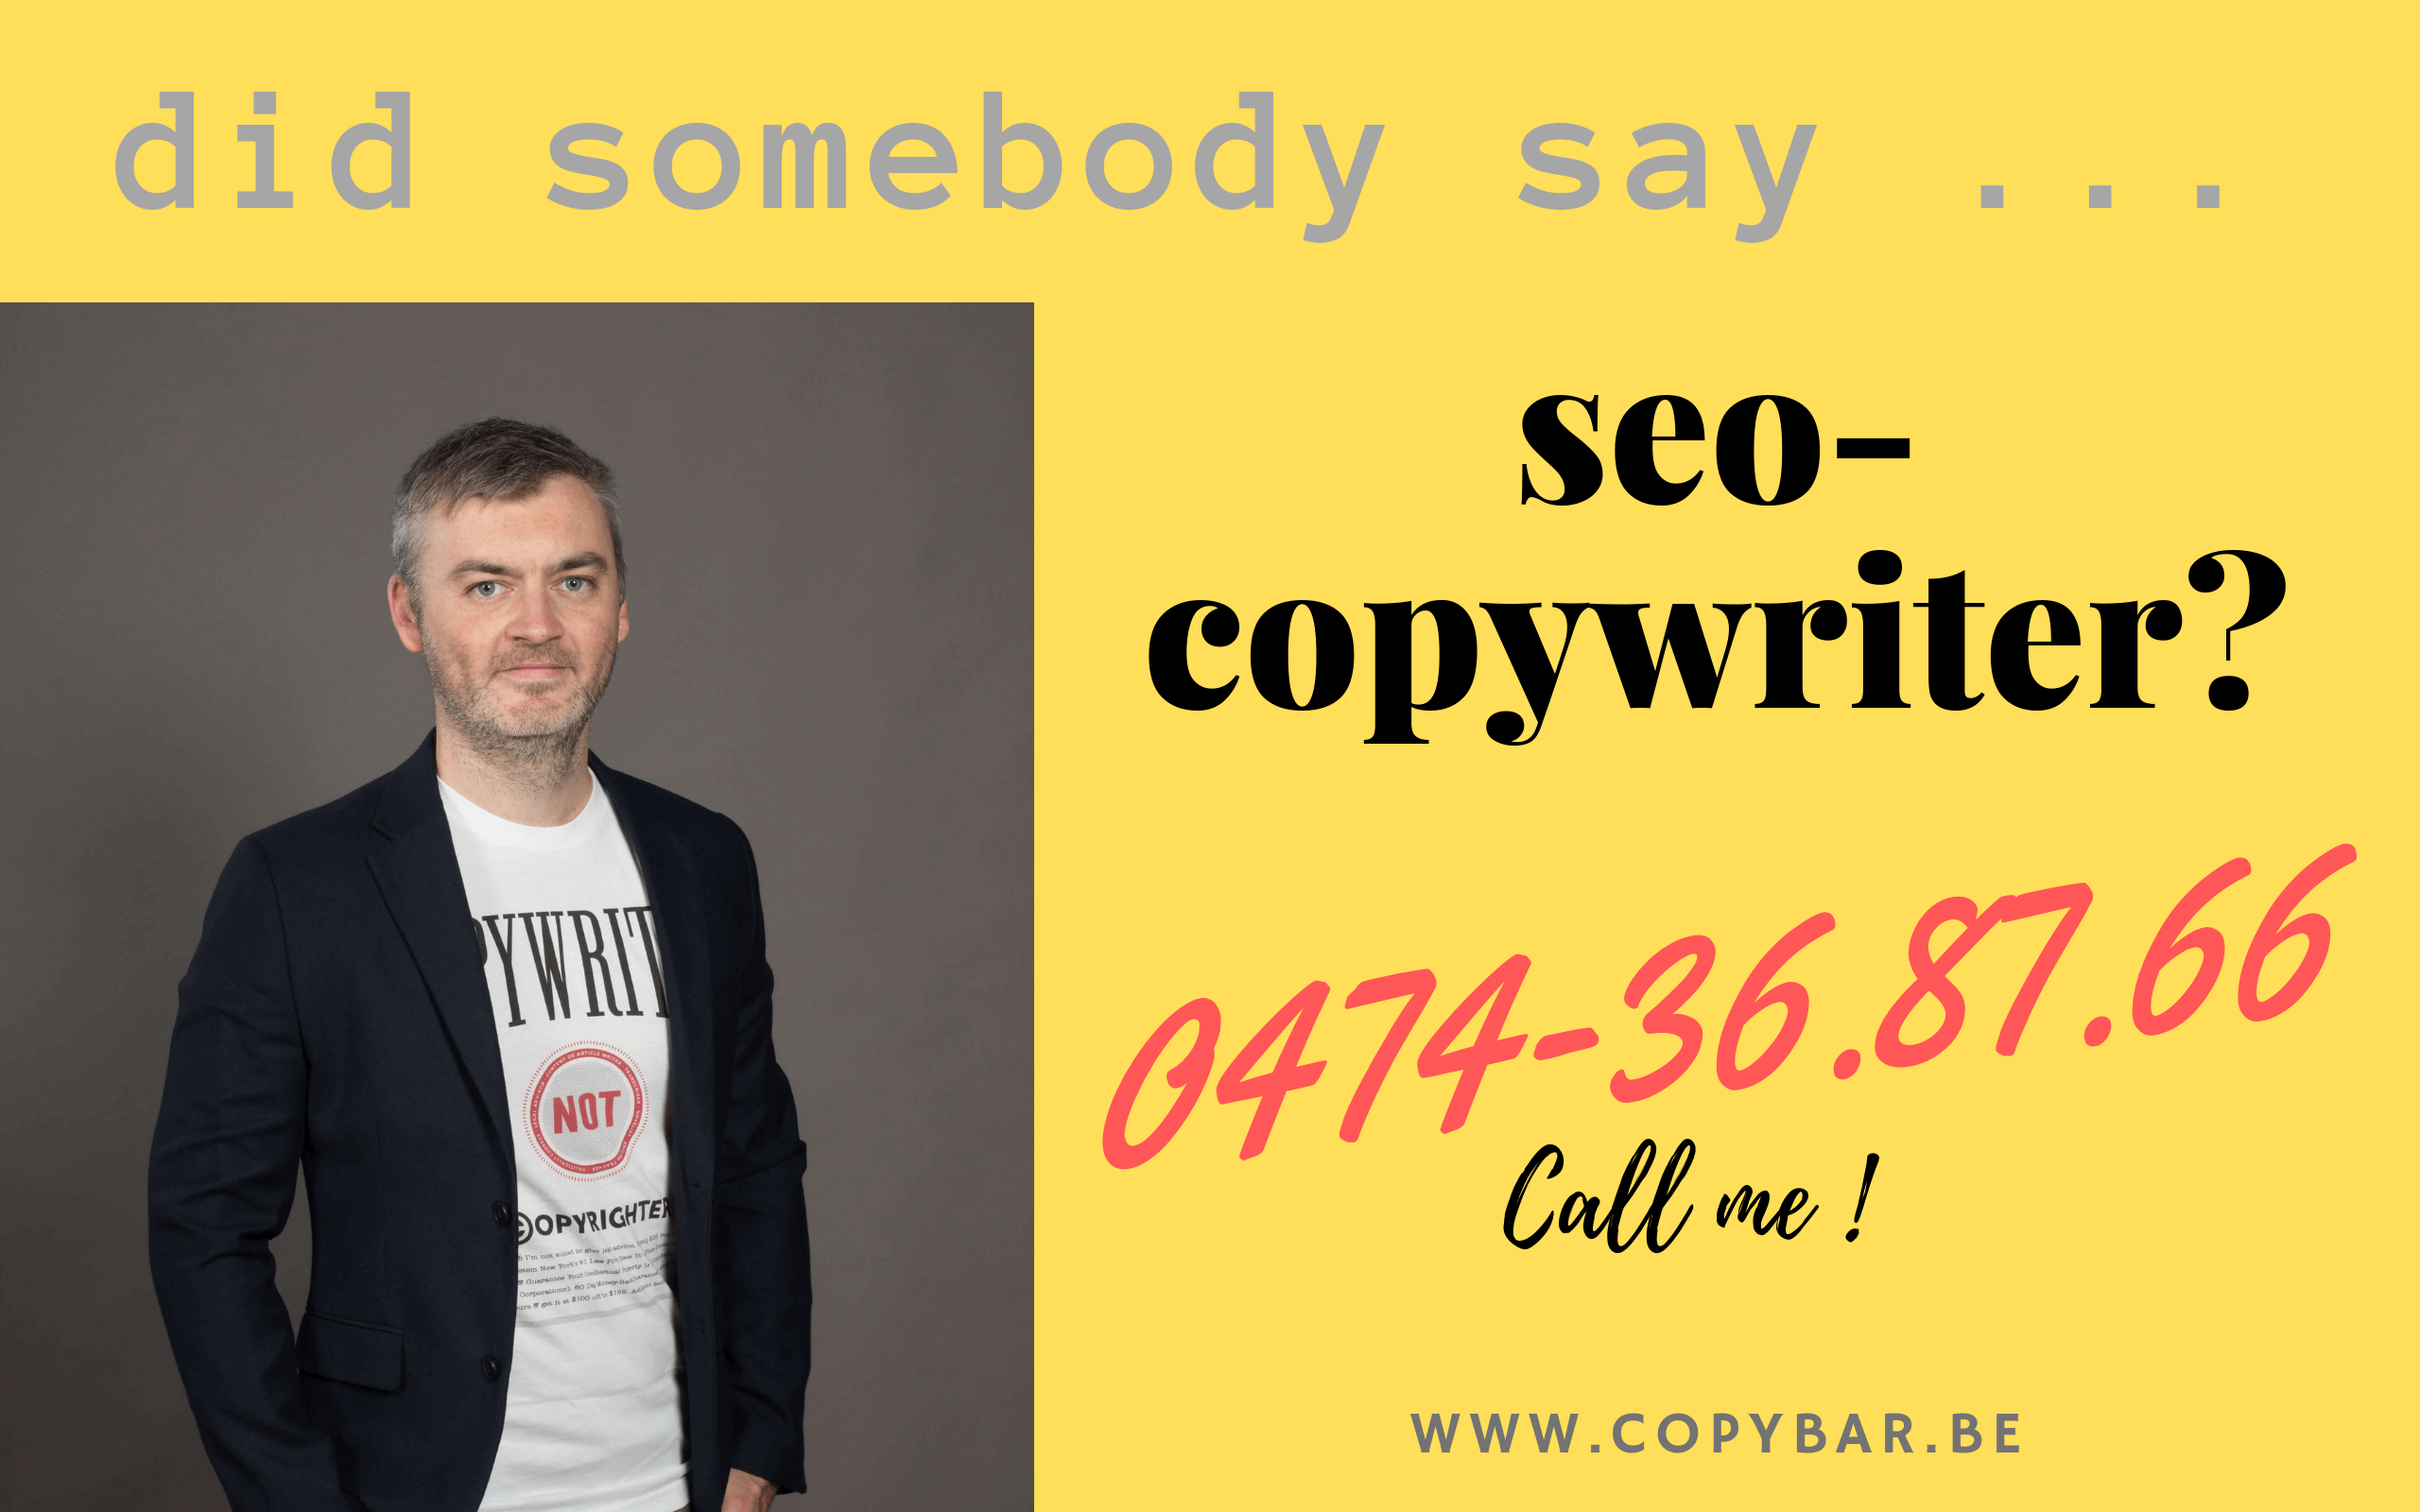 seo-copywriter nodig